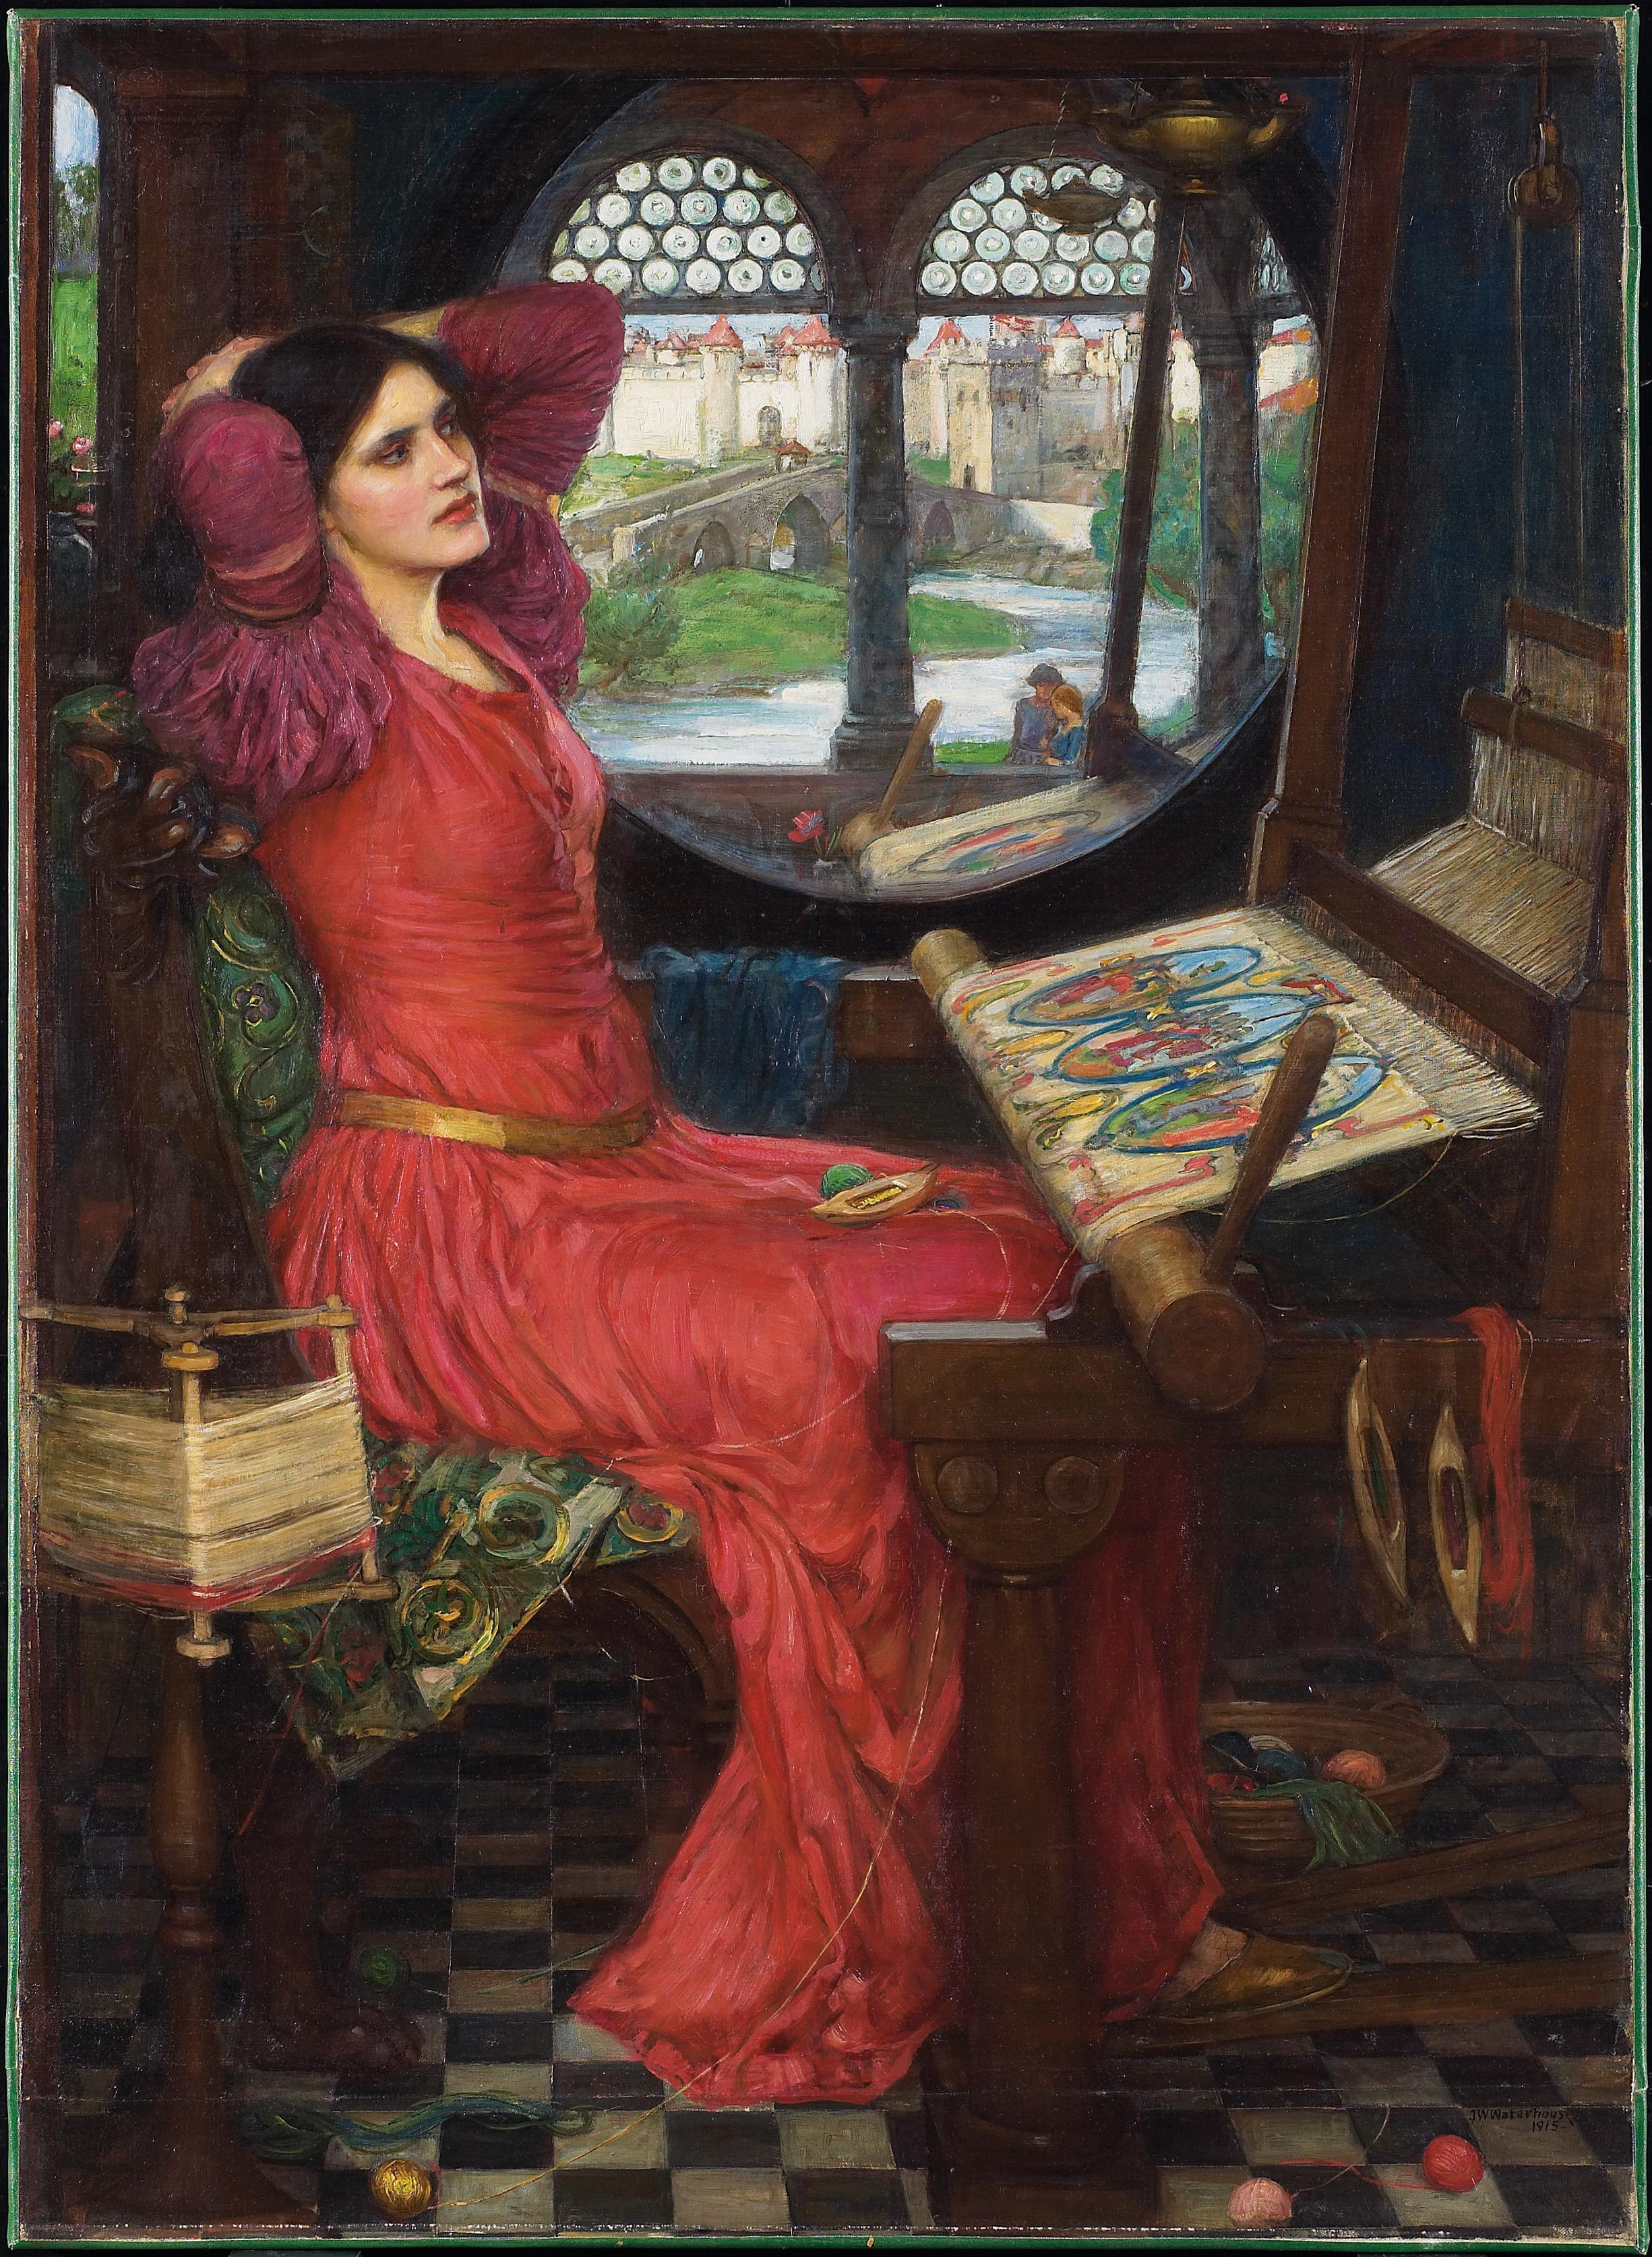 external image John_William_Waterhouse_-_I_am_half-sick_of_shadows,_said_the_lady_of_shalott.JPG